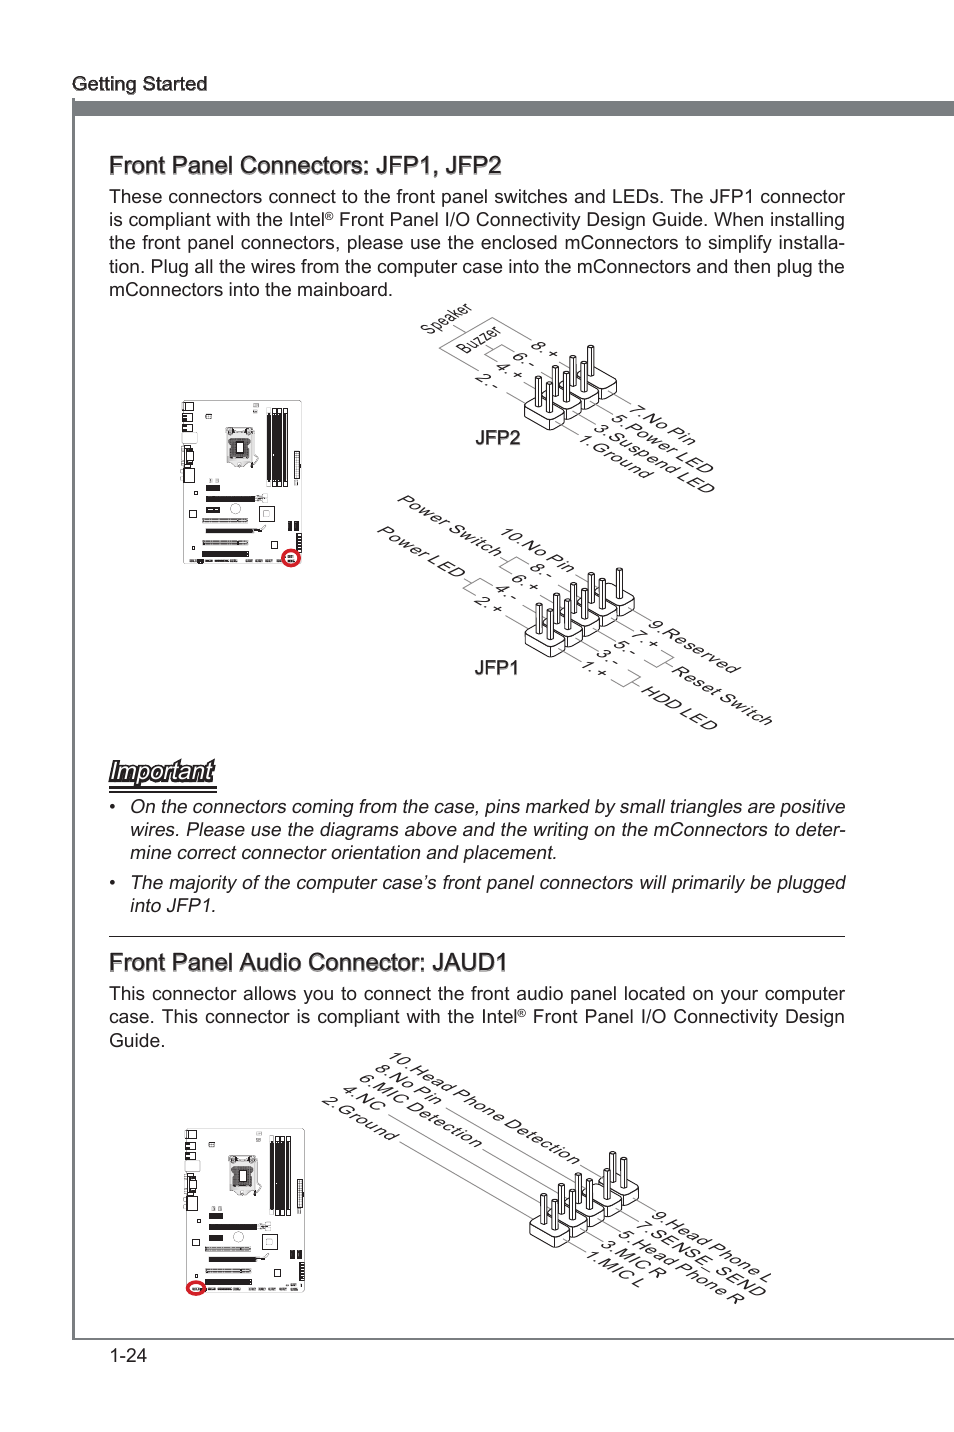 medium resolution of front panel connectors jfp1 jfp2 front panel audio connector front panel audio wiring diagram